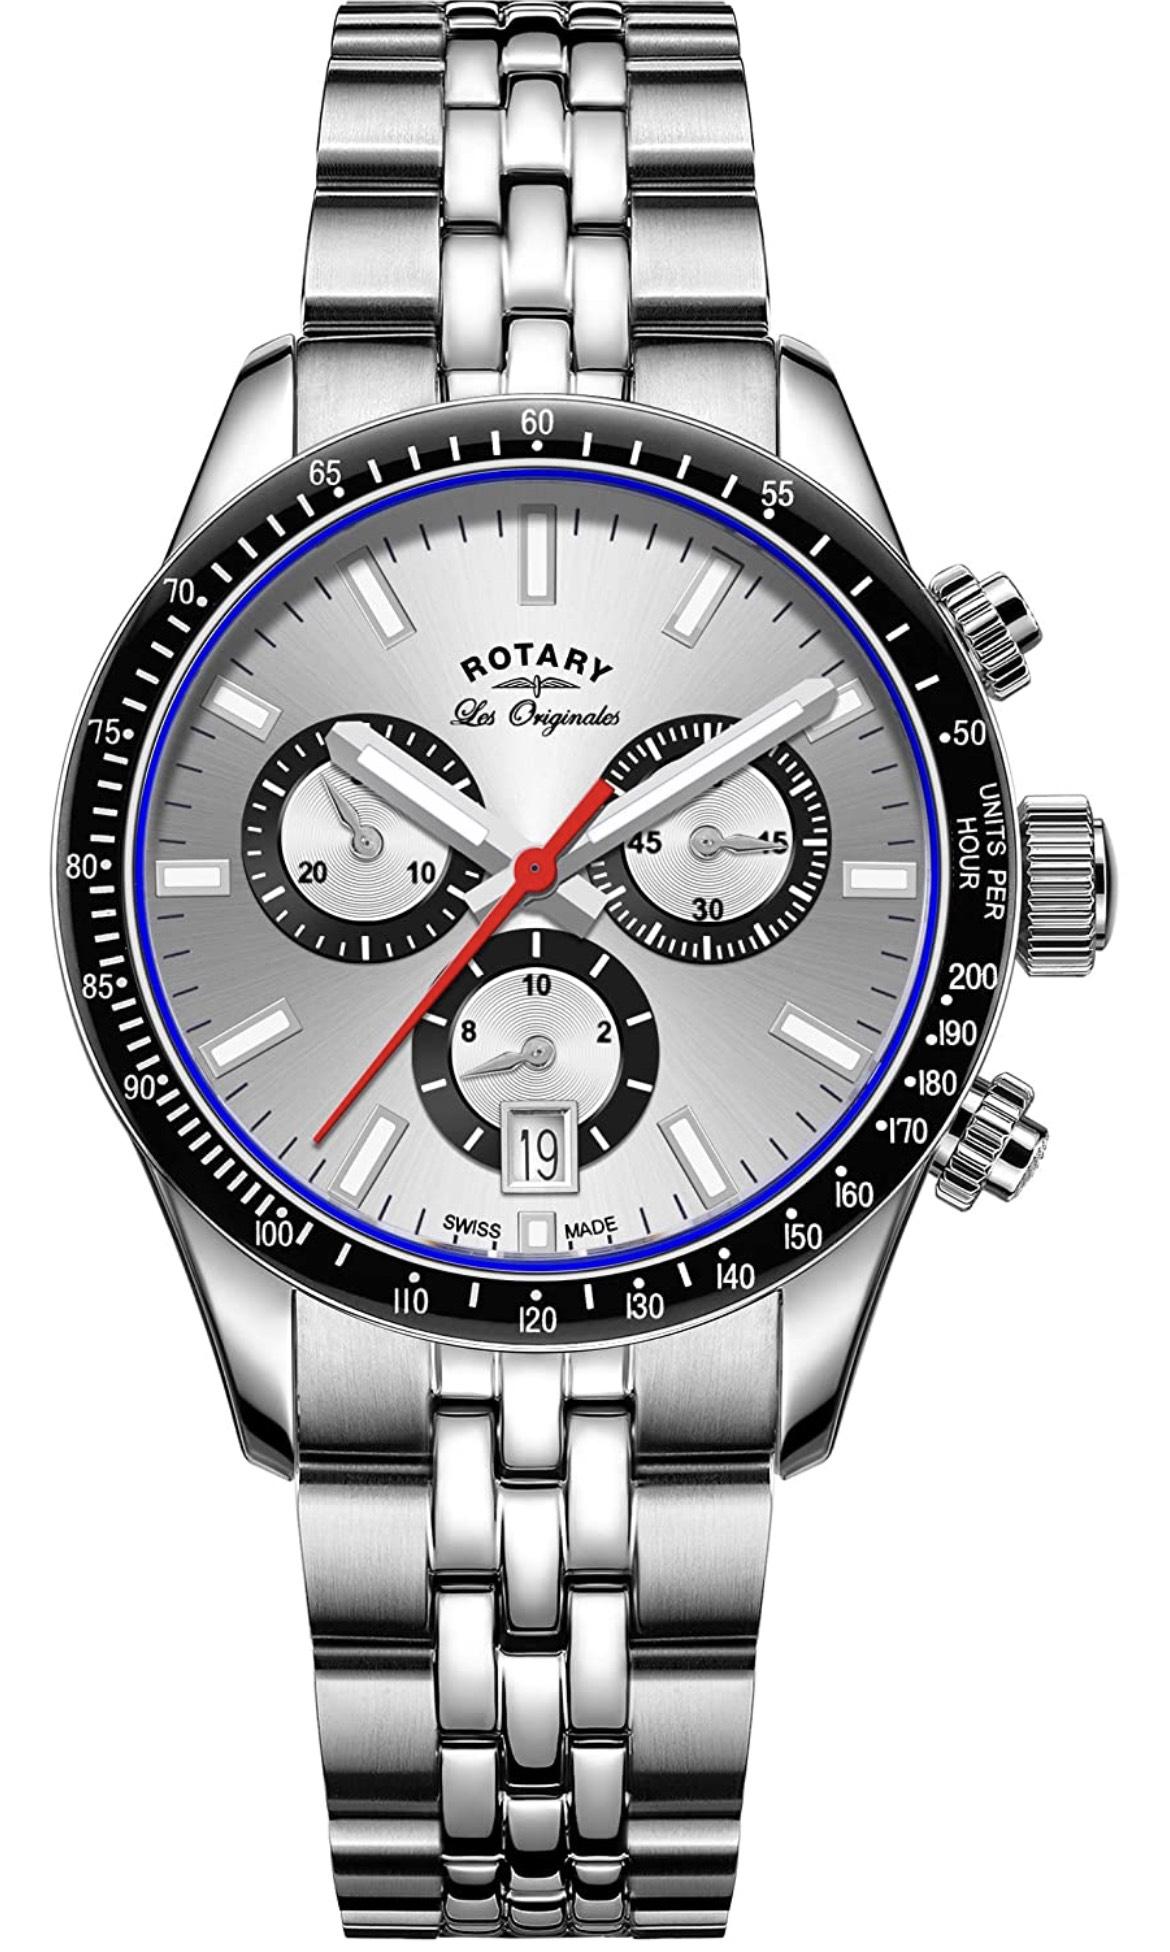 Men's Rotary 'Les Originales' Chronograph Quartz Watch GB90151/06 - £119.99 @ Amazon